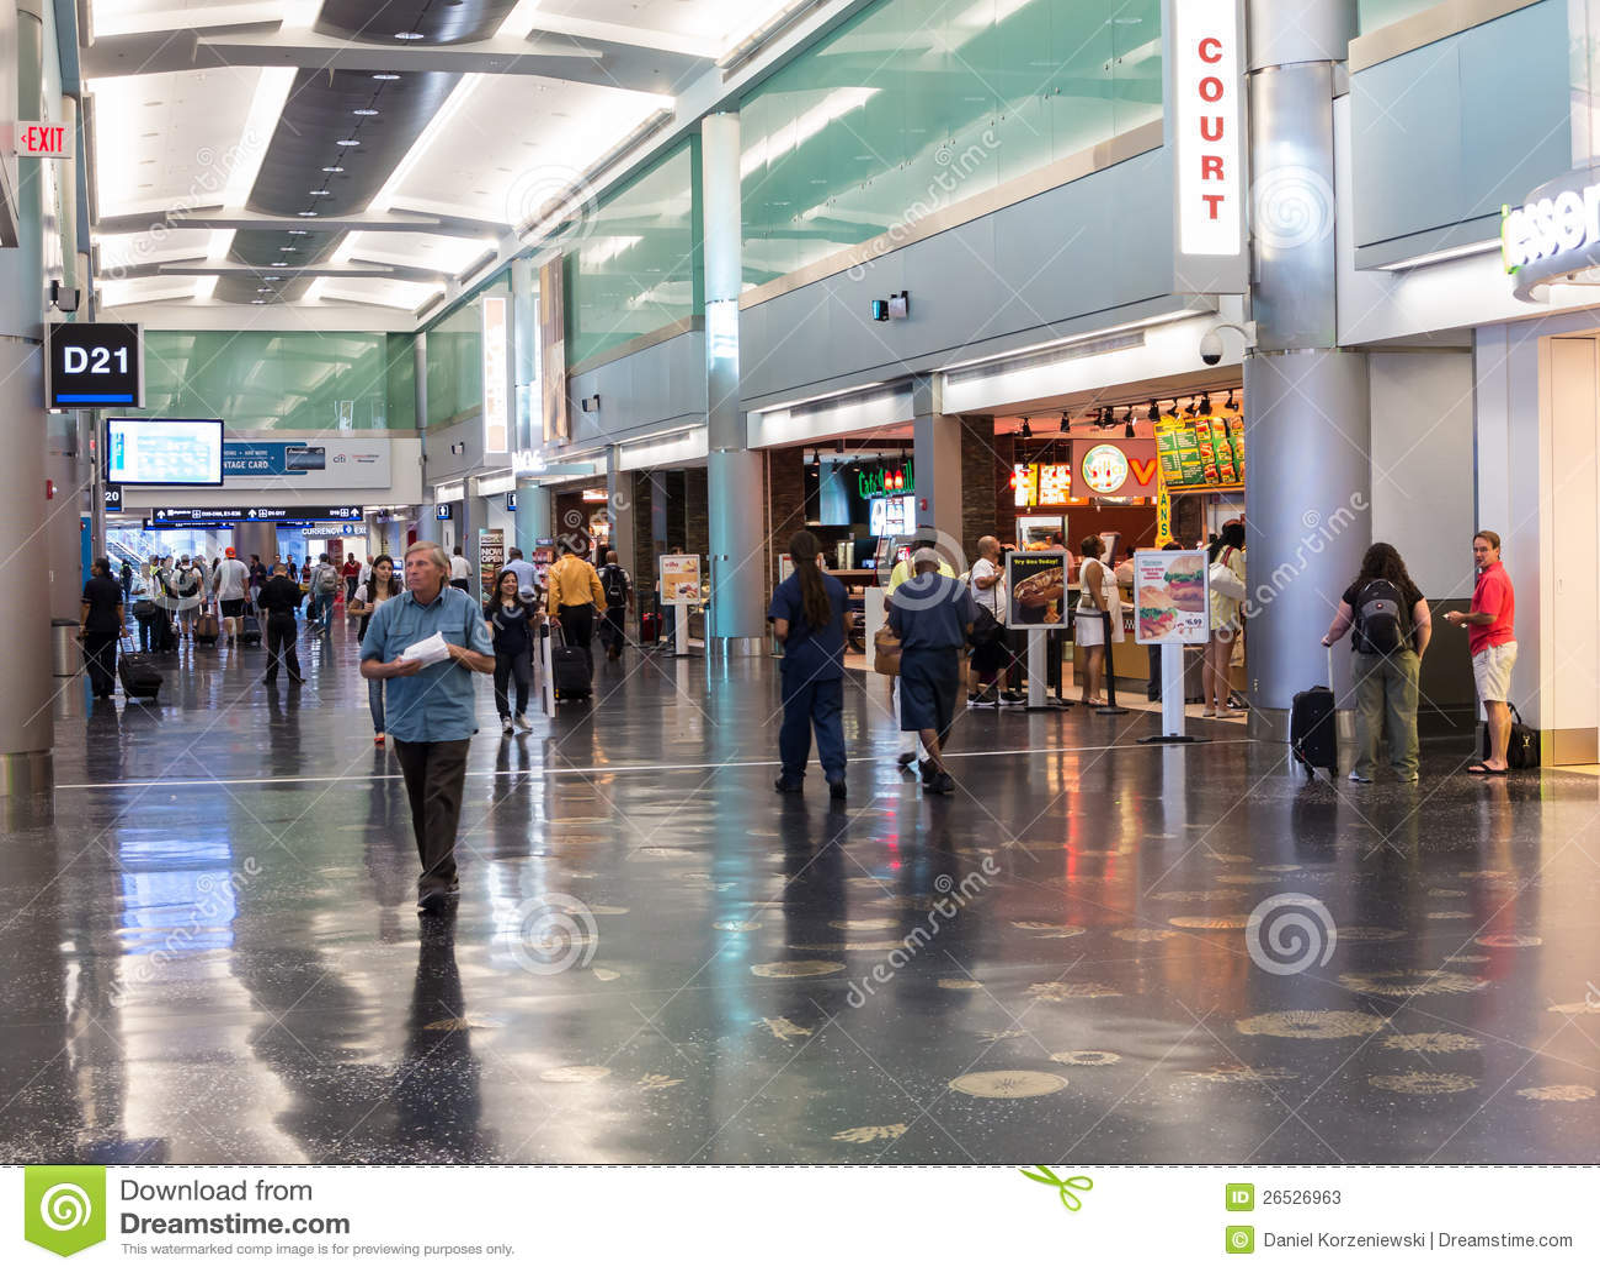 terminal d at miami international airport editorial stock